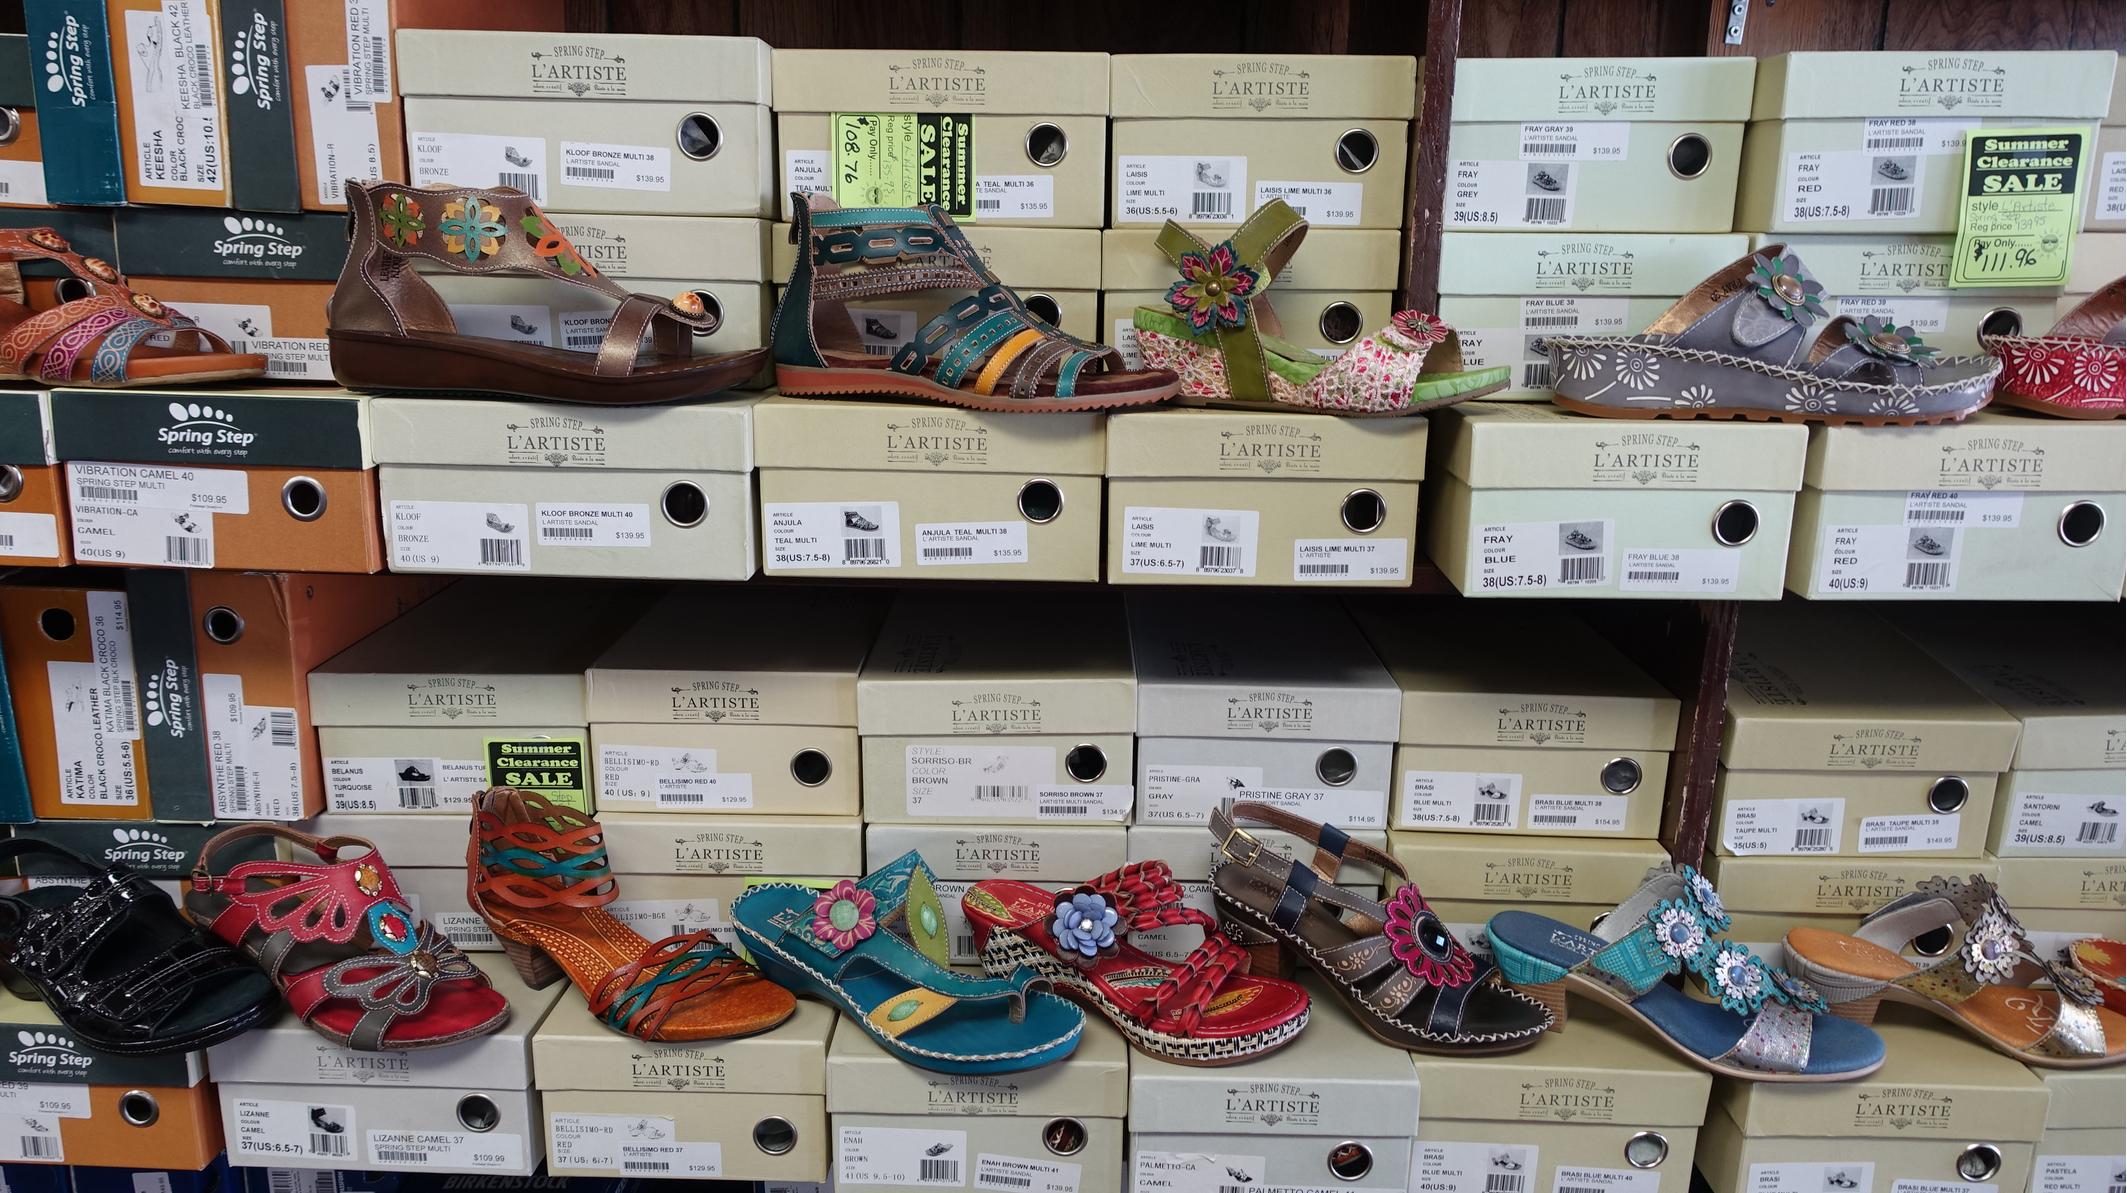 Shoes or folk art?